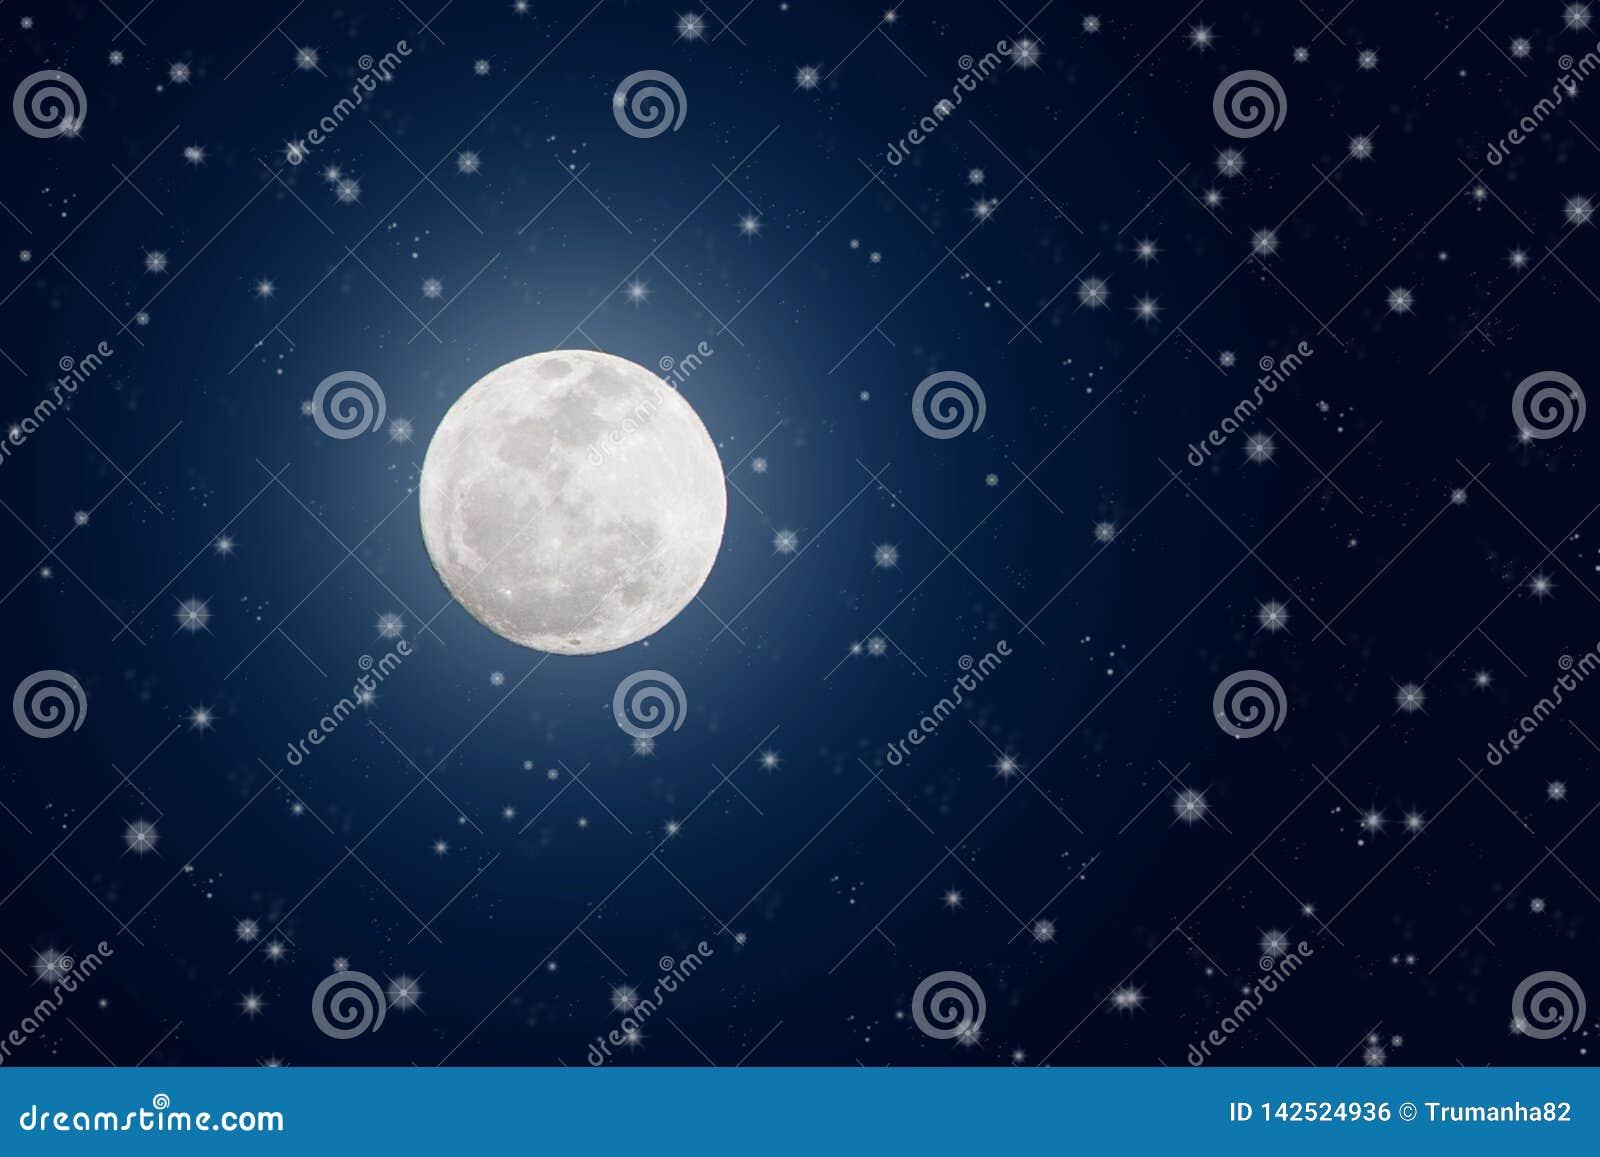 Bright Full Moon and Twinkle Stars in Dark Blue Night Sky